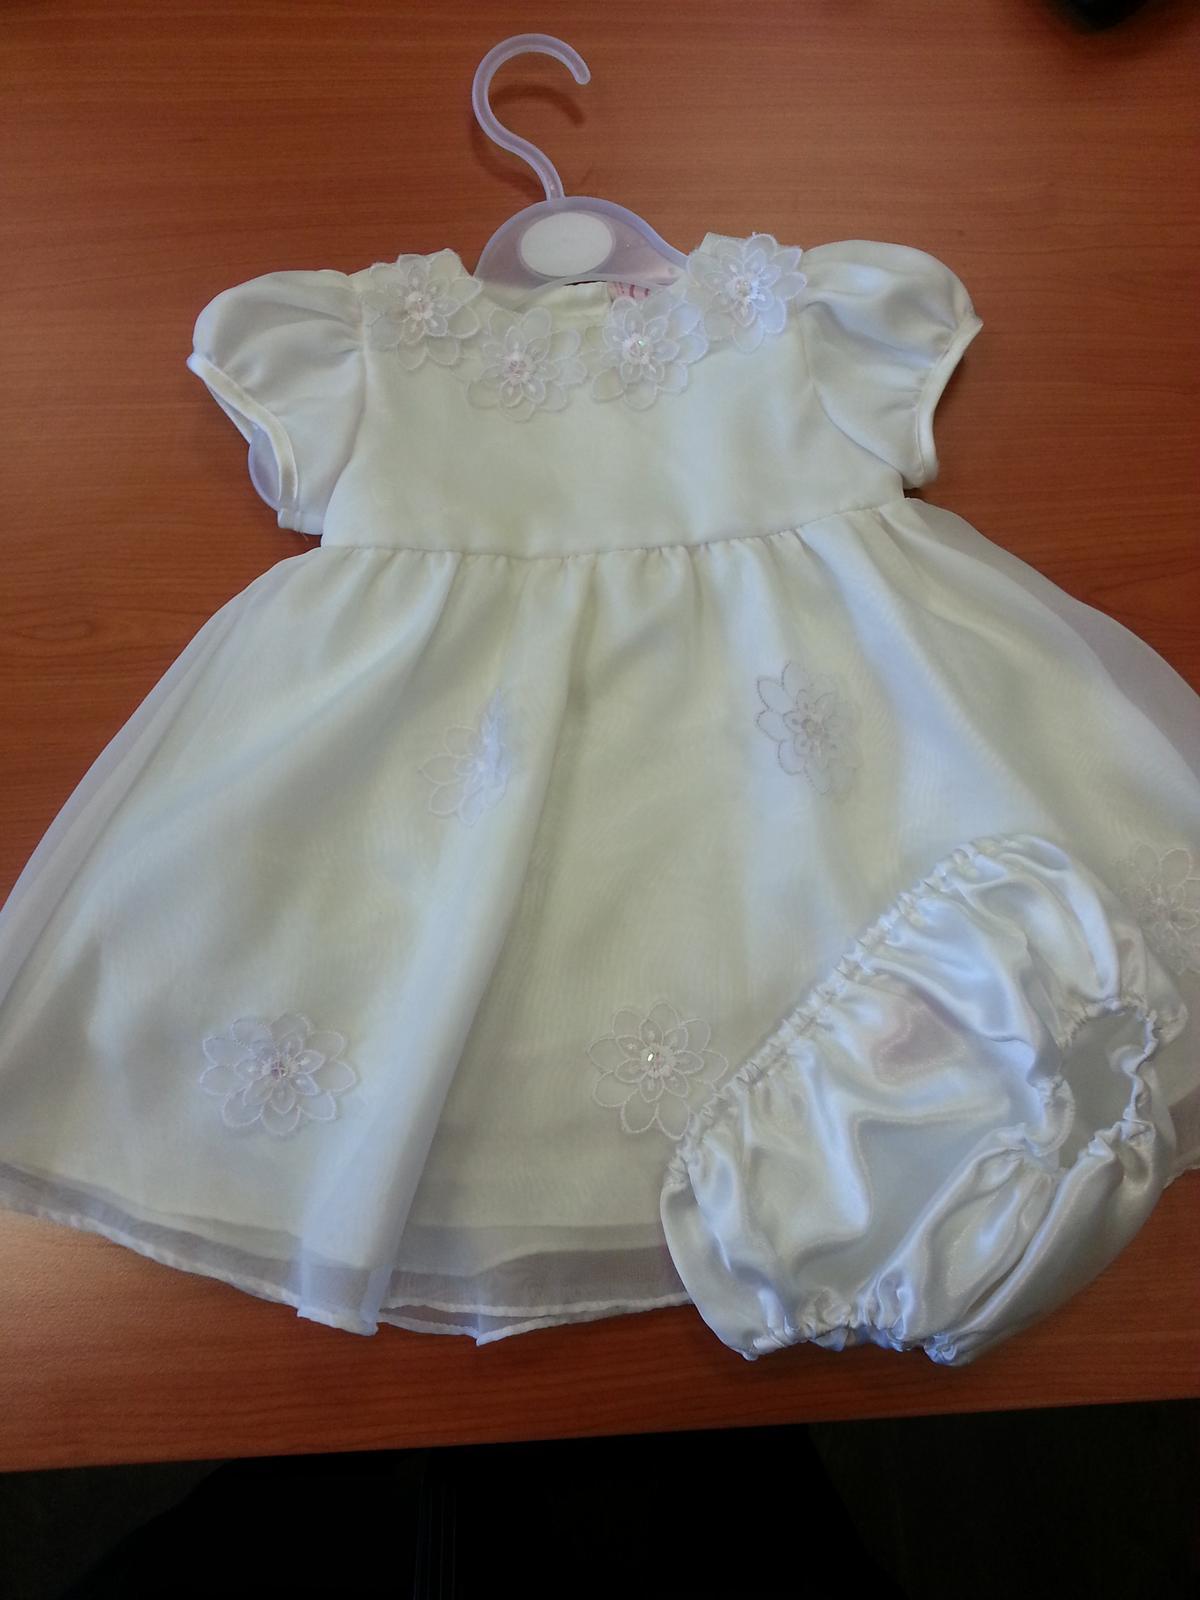 572c2c11d783 Šaty na krst pre dievčatko